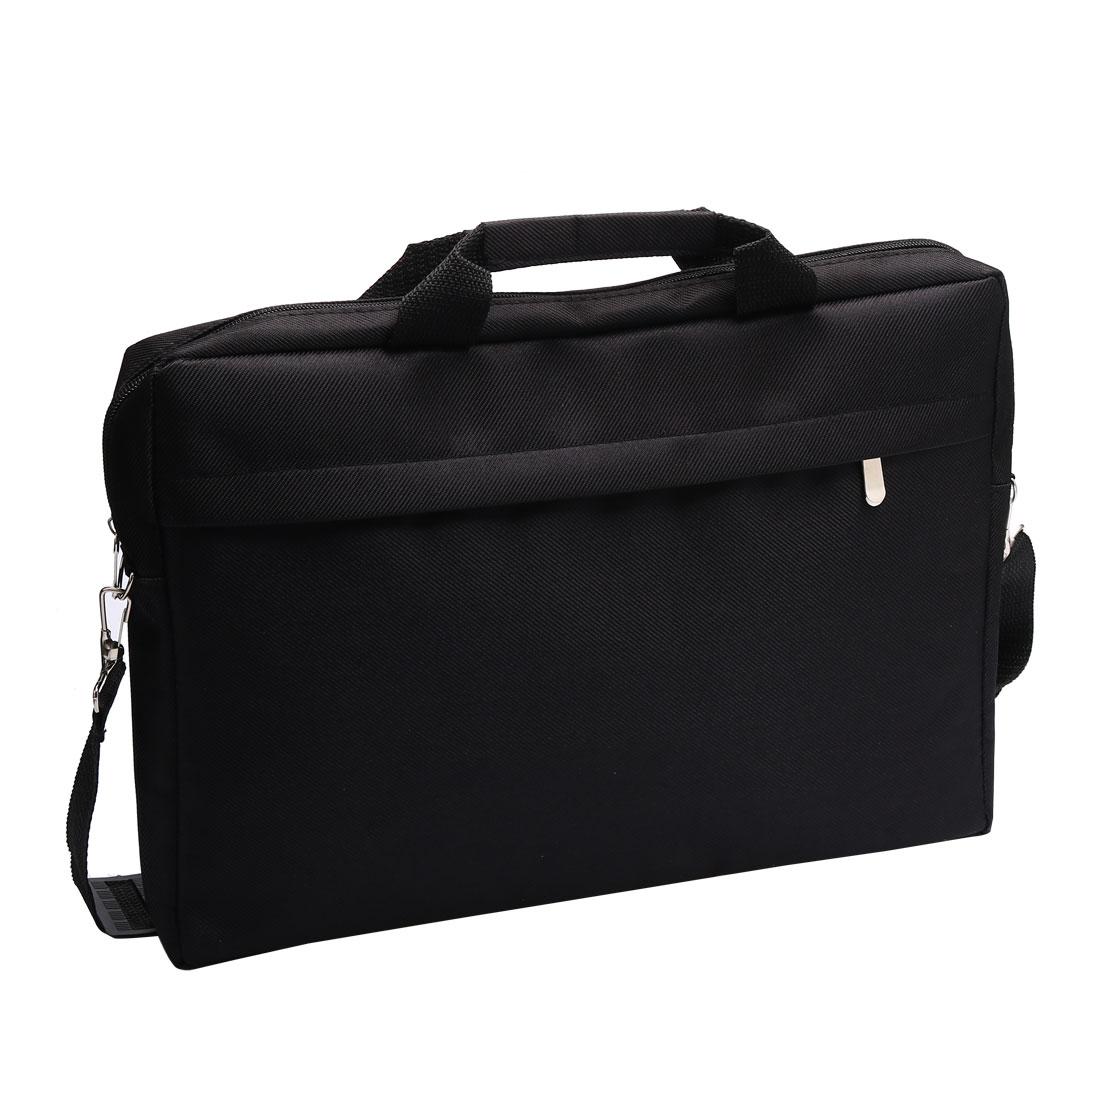 "15.4"" 15.6"" Laptop Notebook Carry Bag Case Pouch w Shoulder Strap Black for Acer"